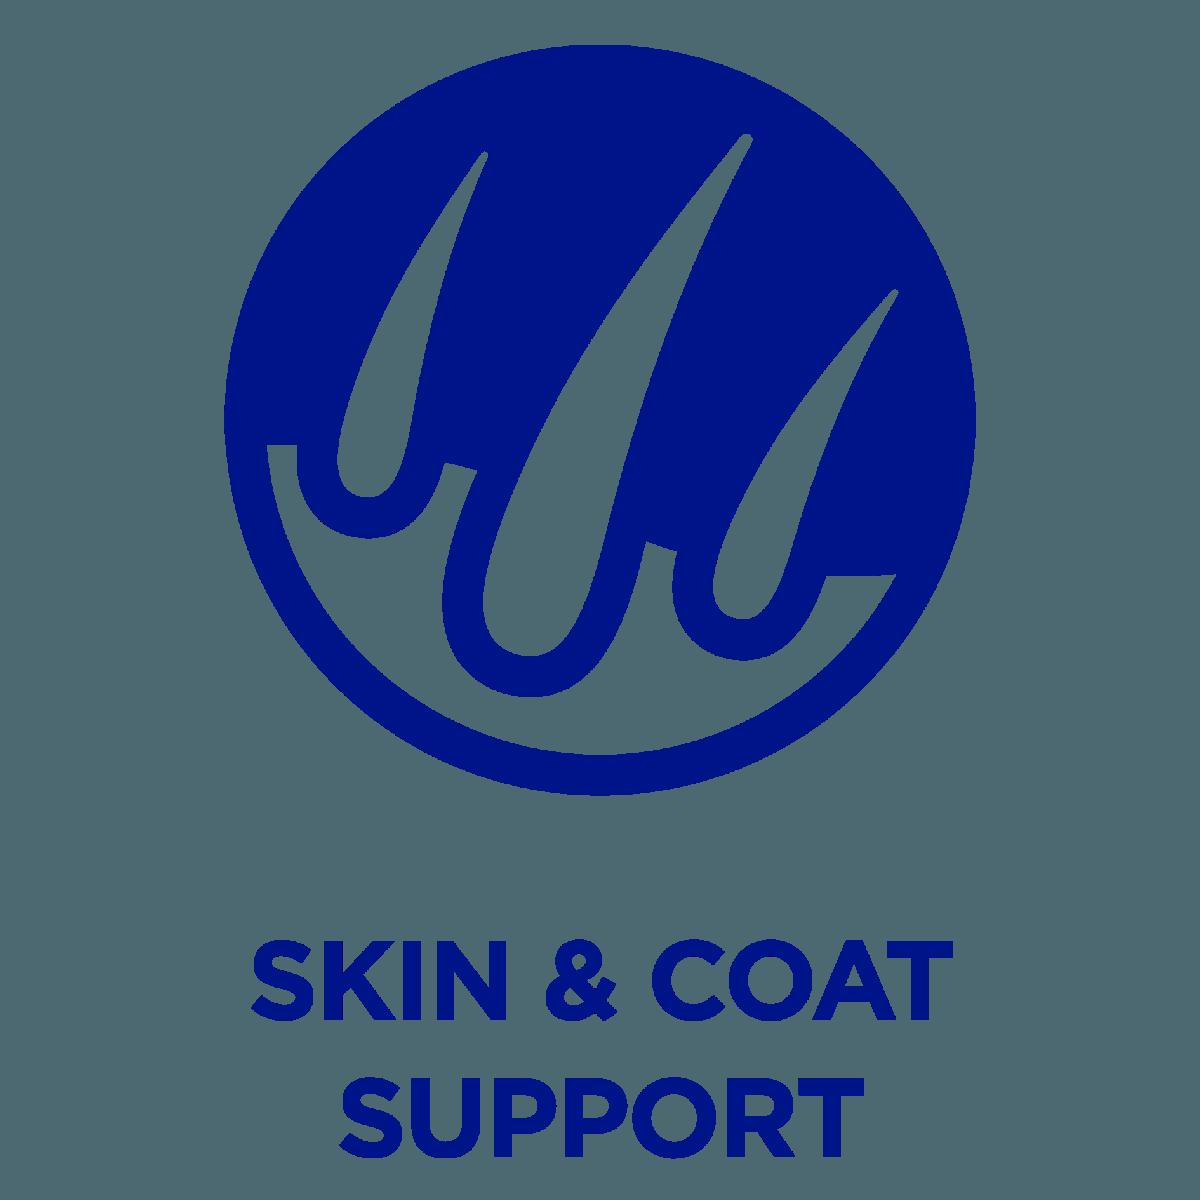 Skin & Coat Support